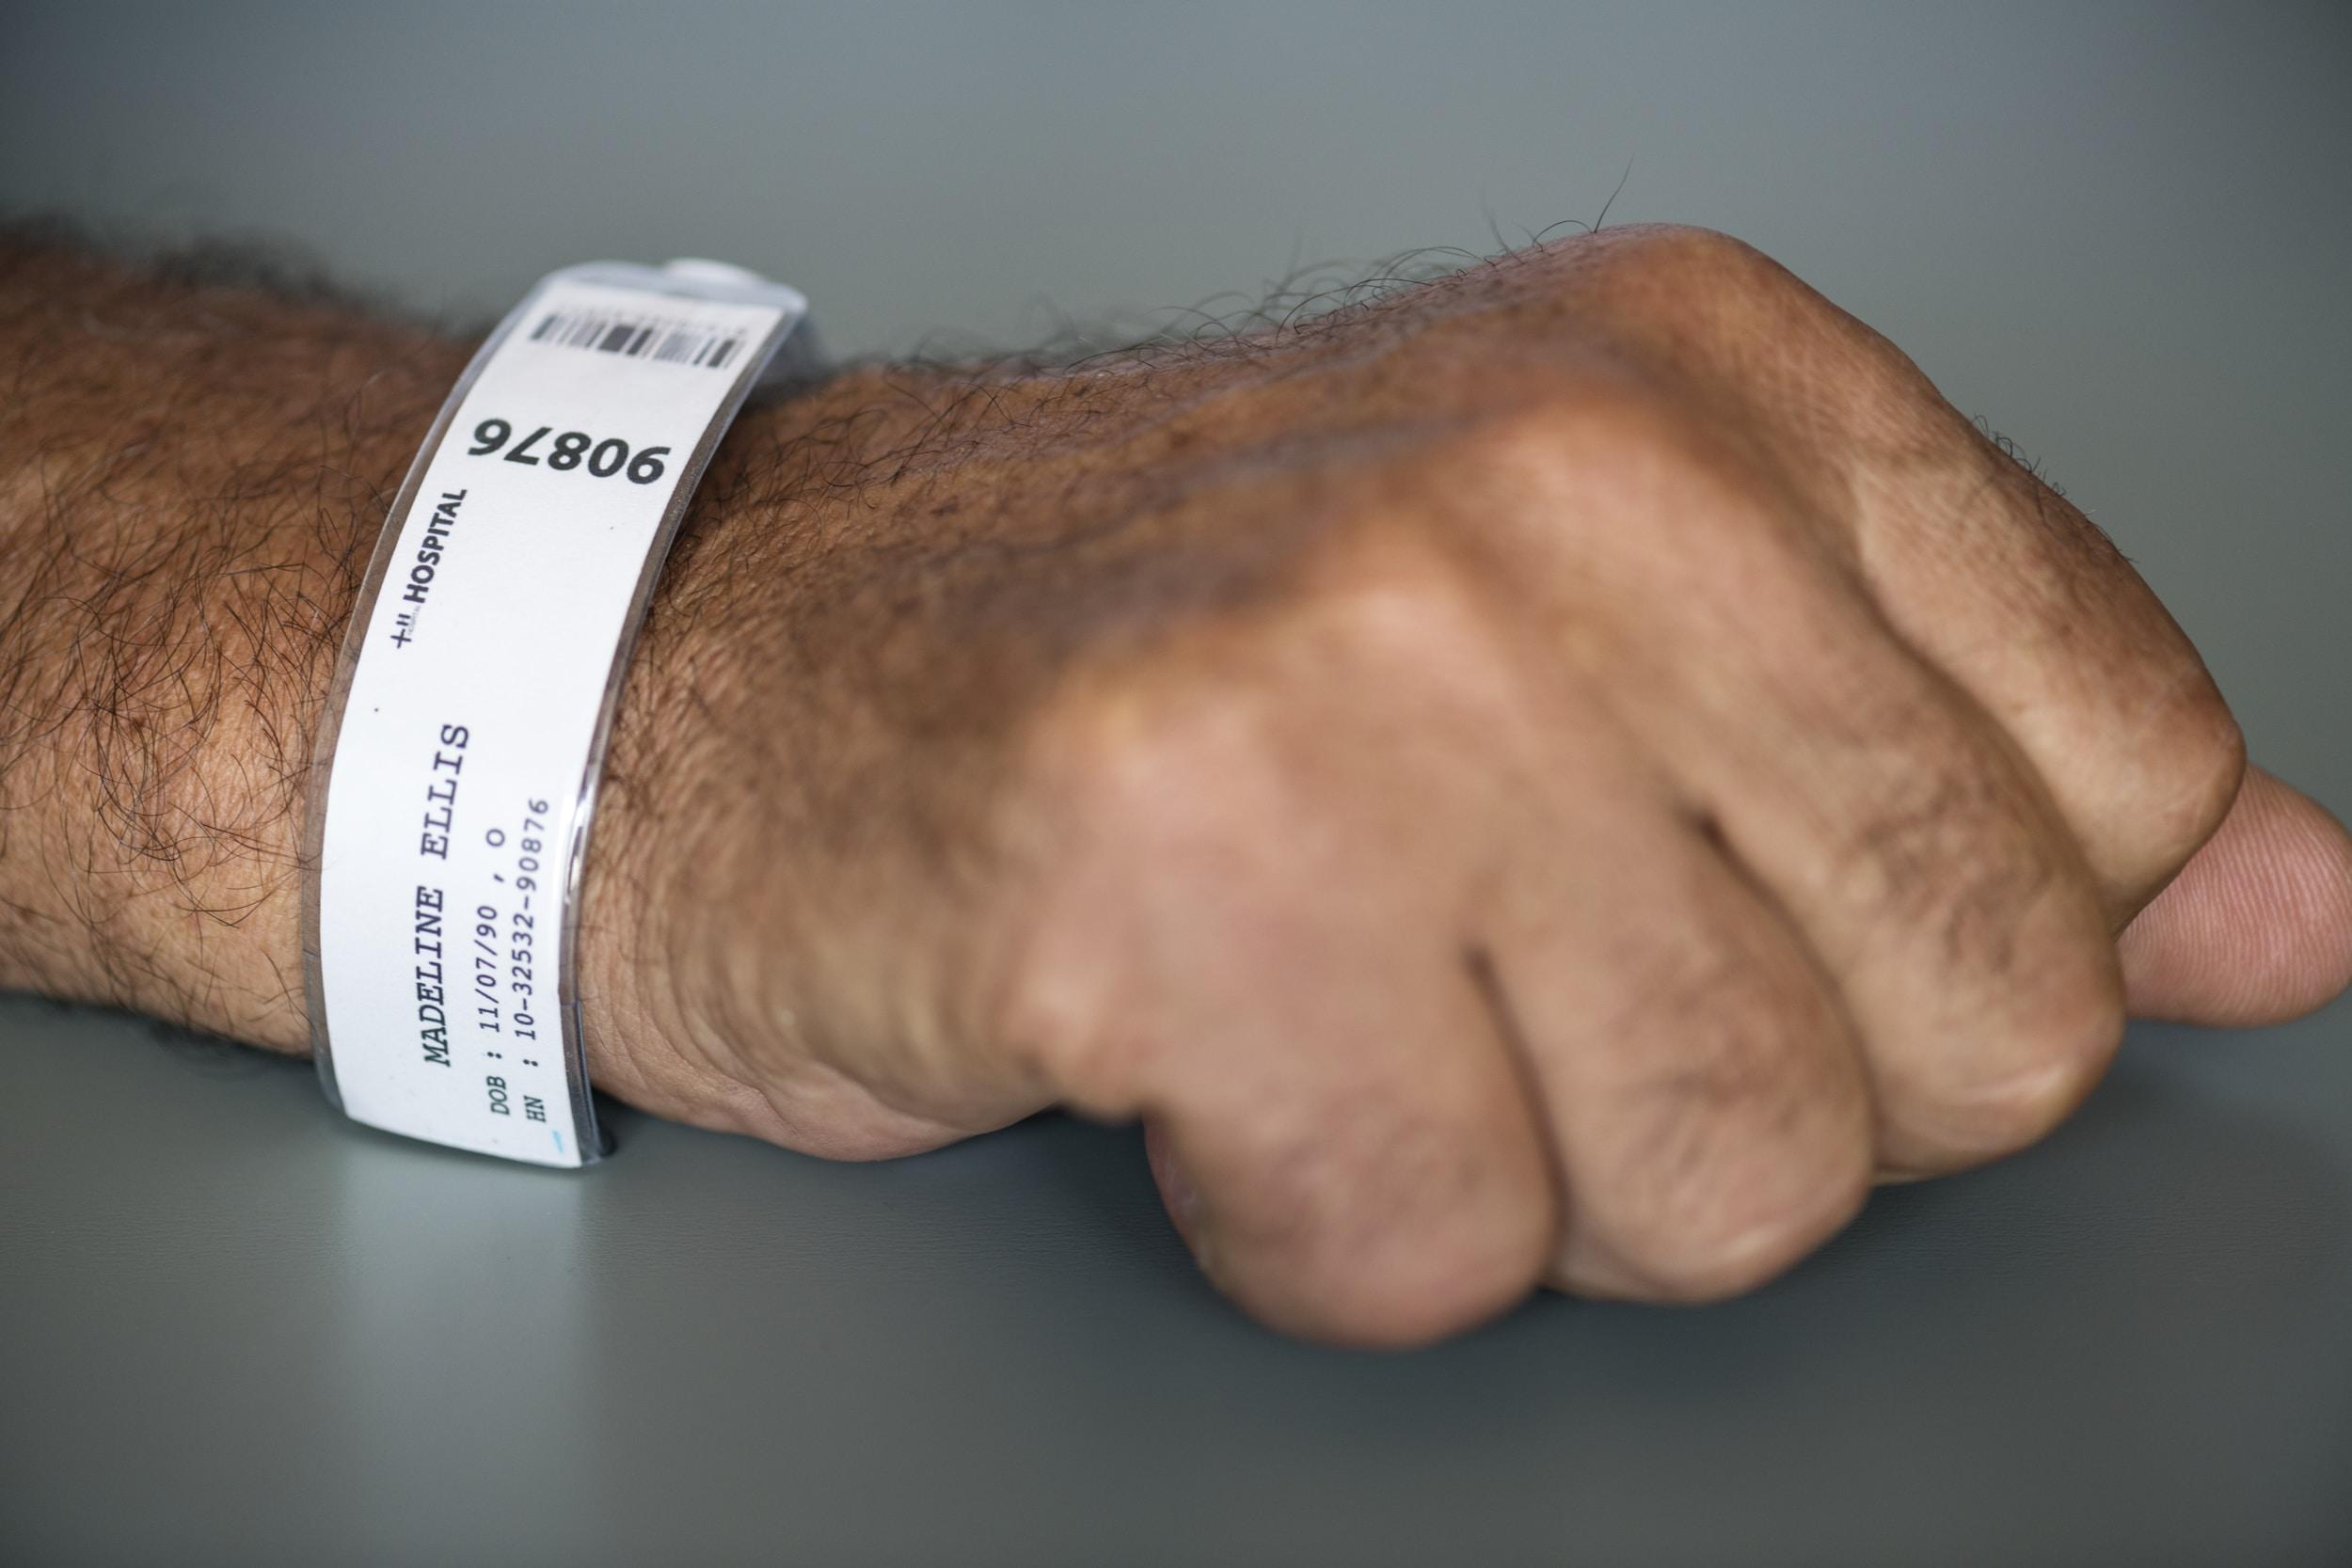 person wearing white bracelet